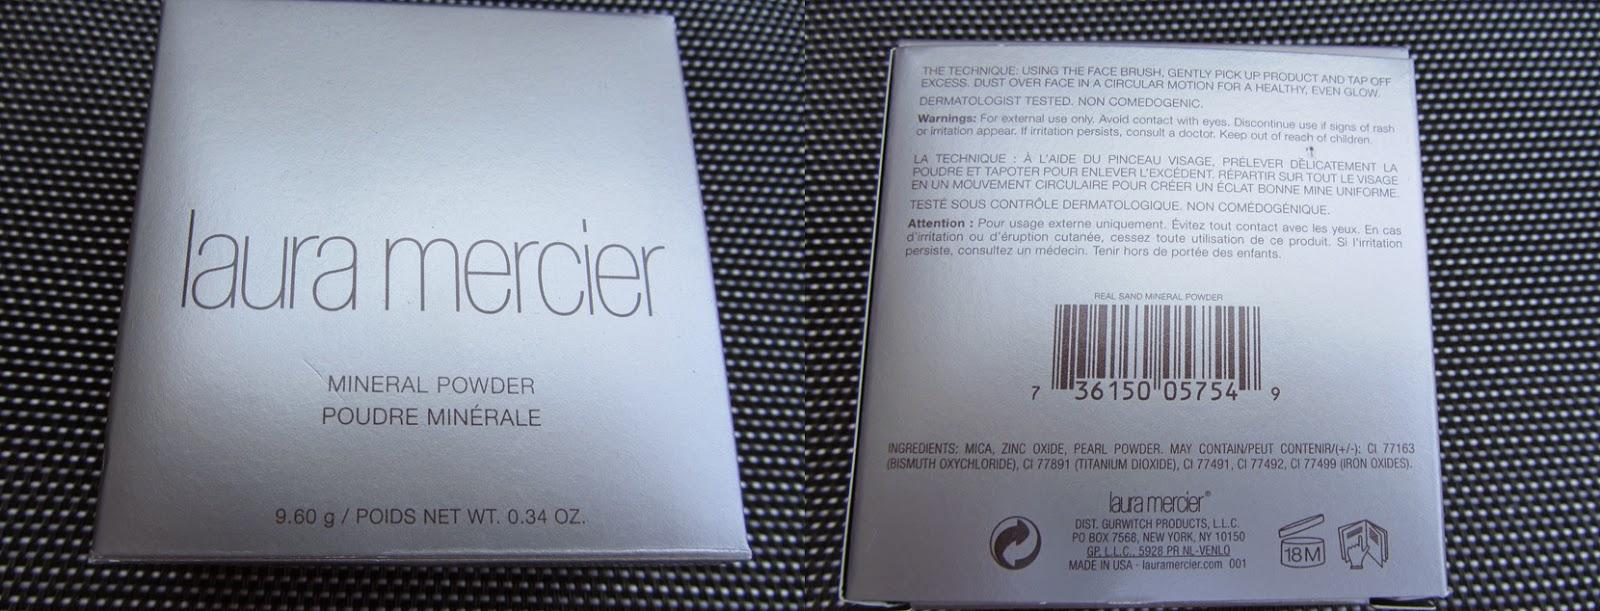 Laura Mercier Mineral Powder SPF 15 Coupon